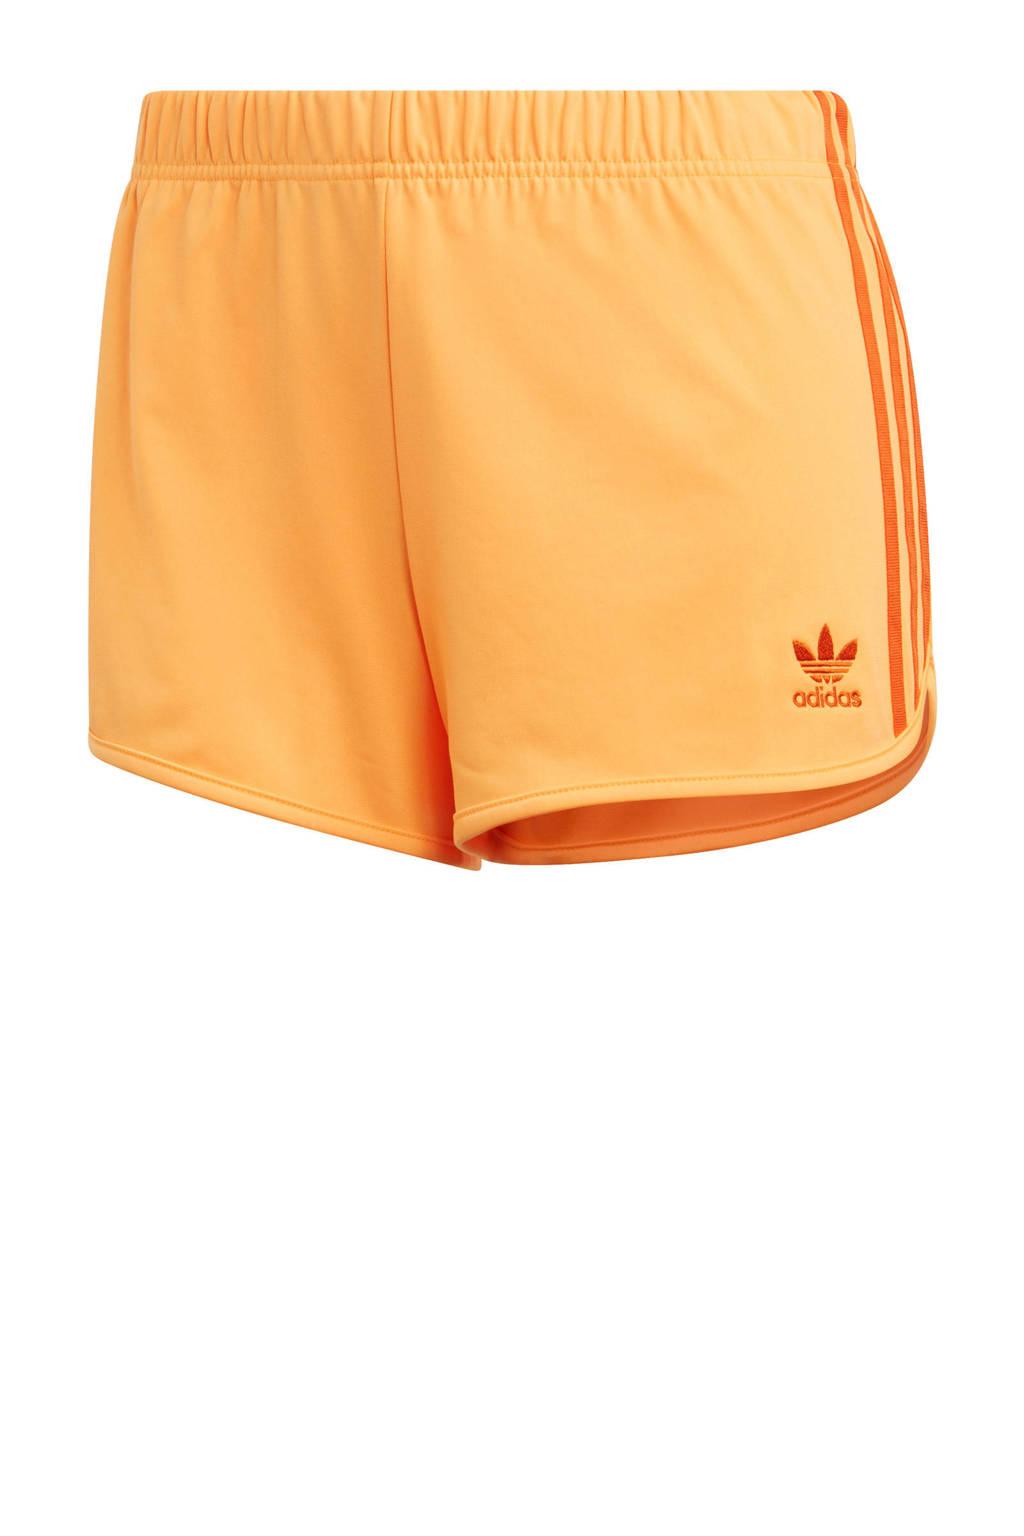 adidas originals Adicolor sweatshort oranje, Oranje